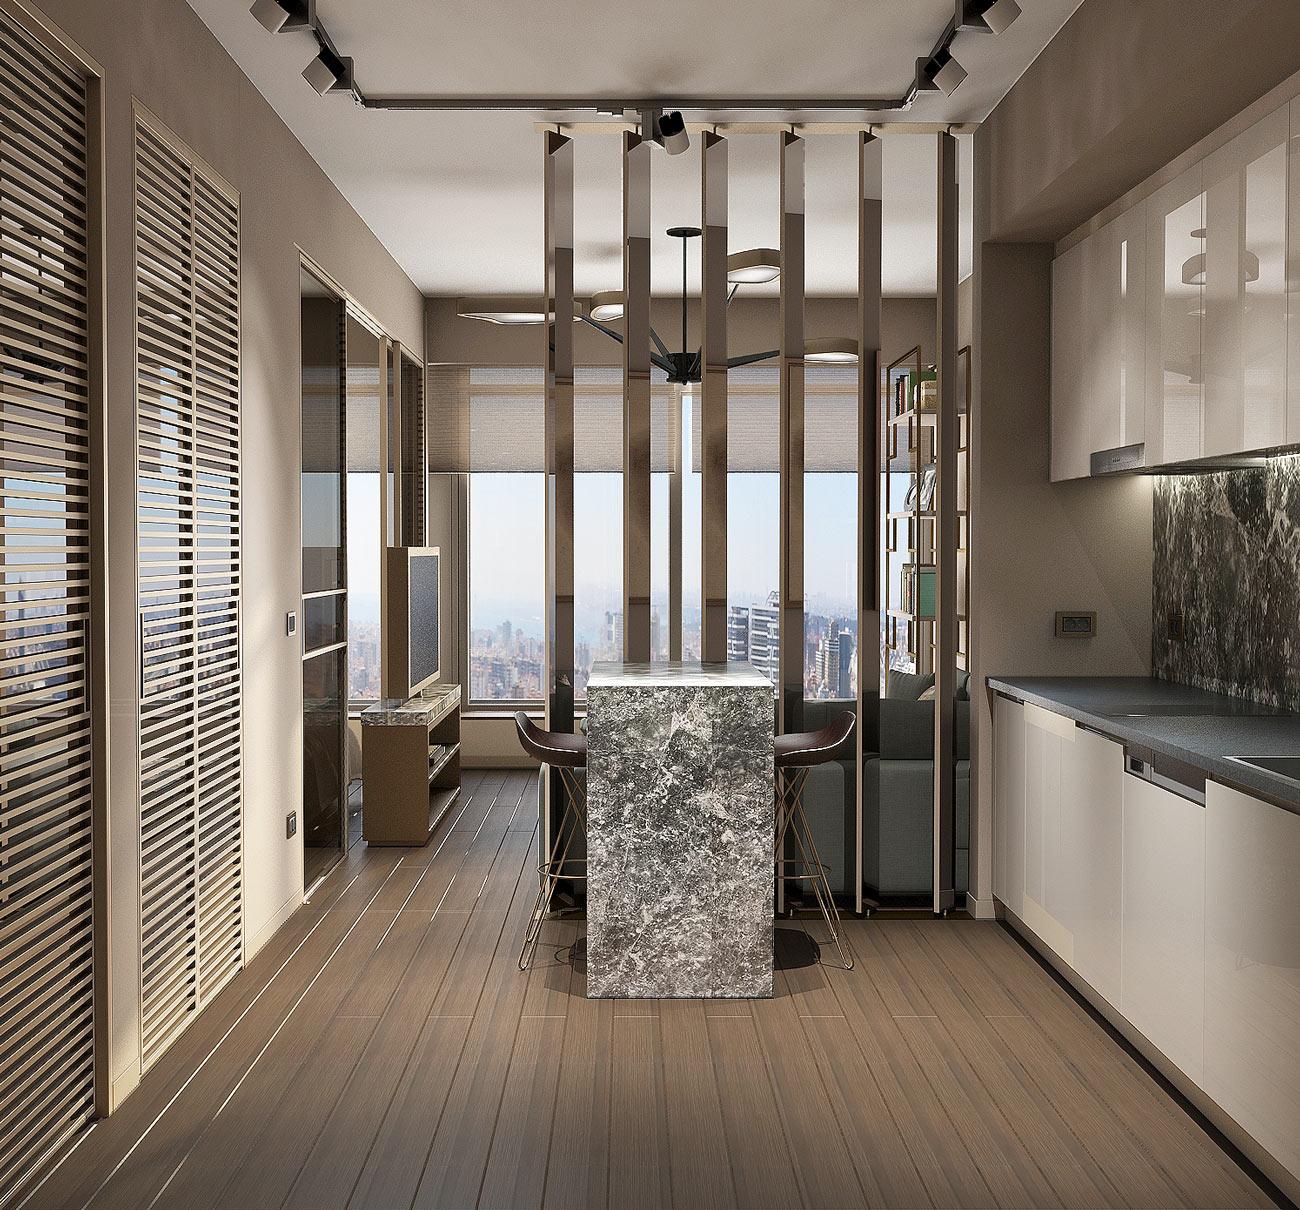 altower-residences-isyanbul-2.jpg